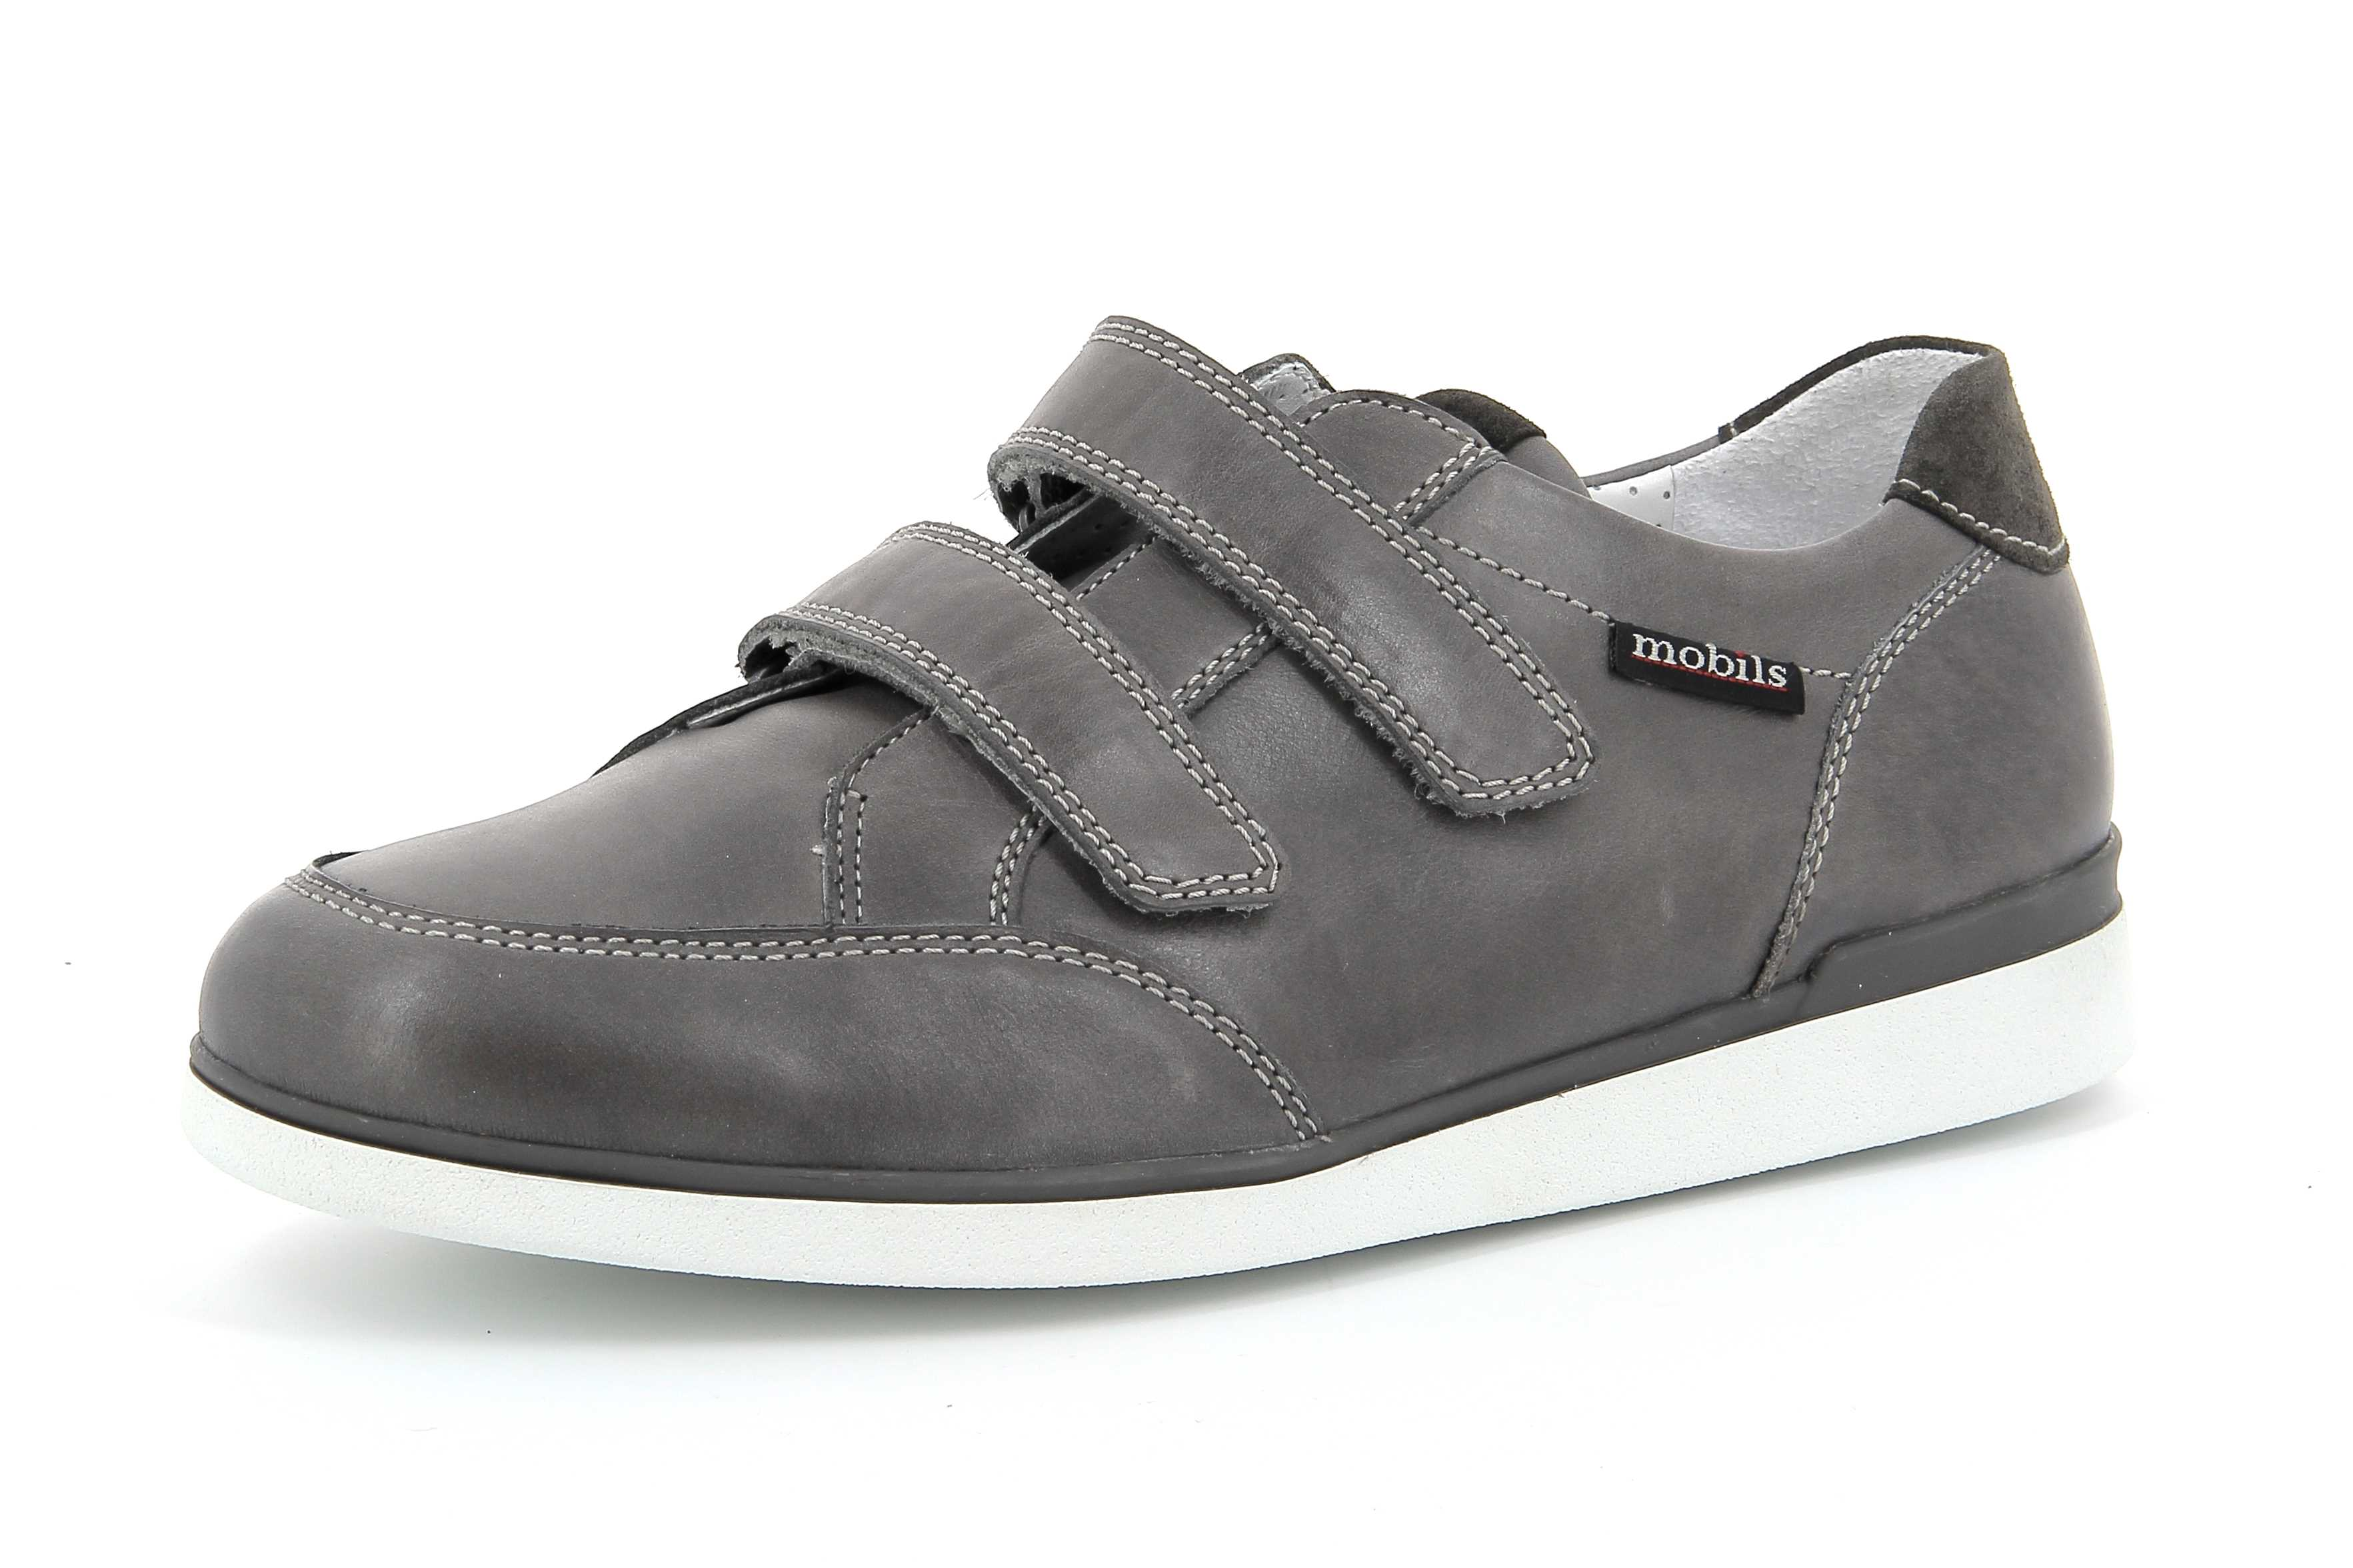 chaussures velcro femme